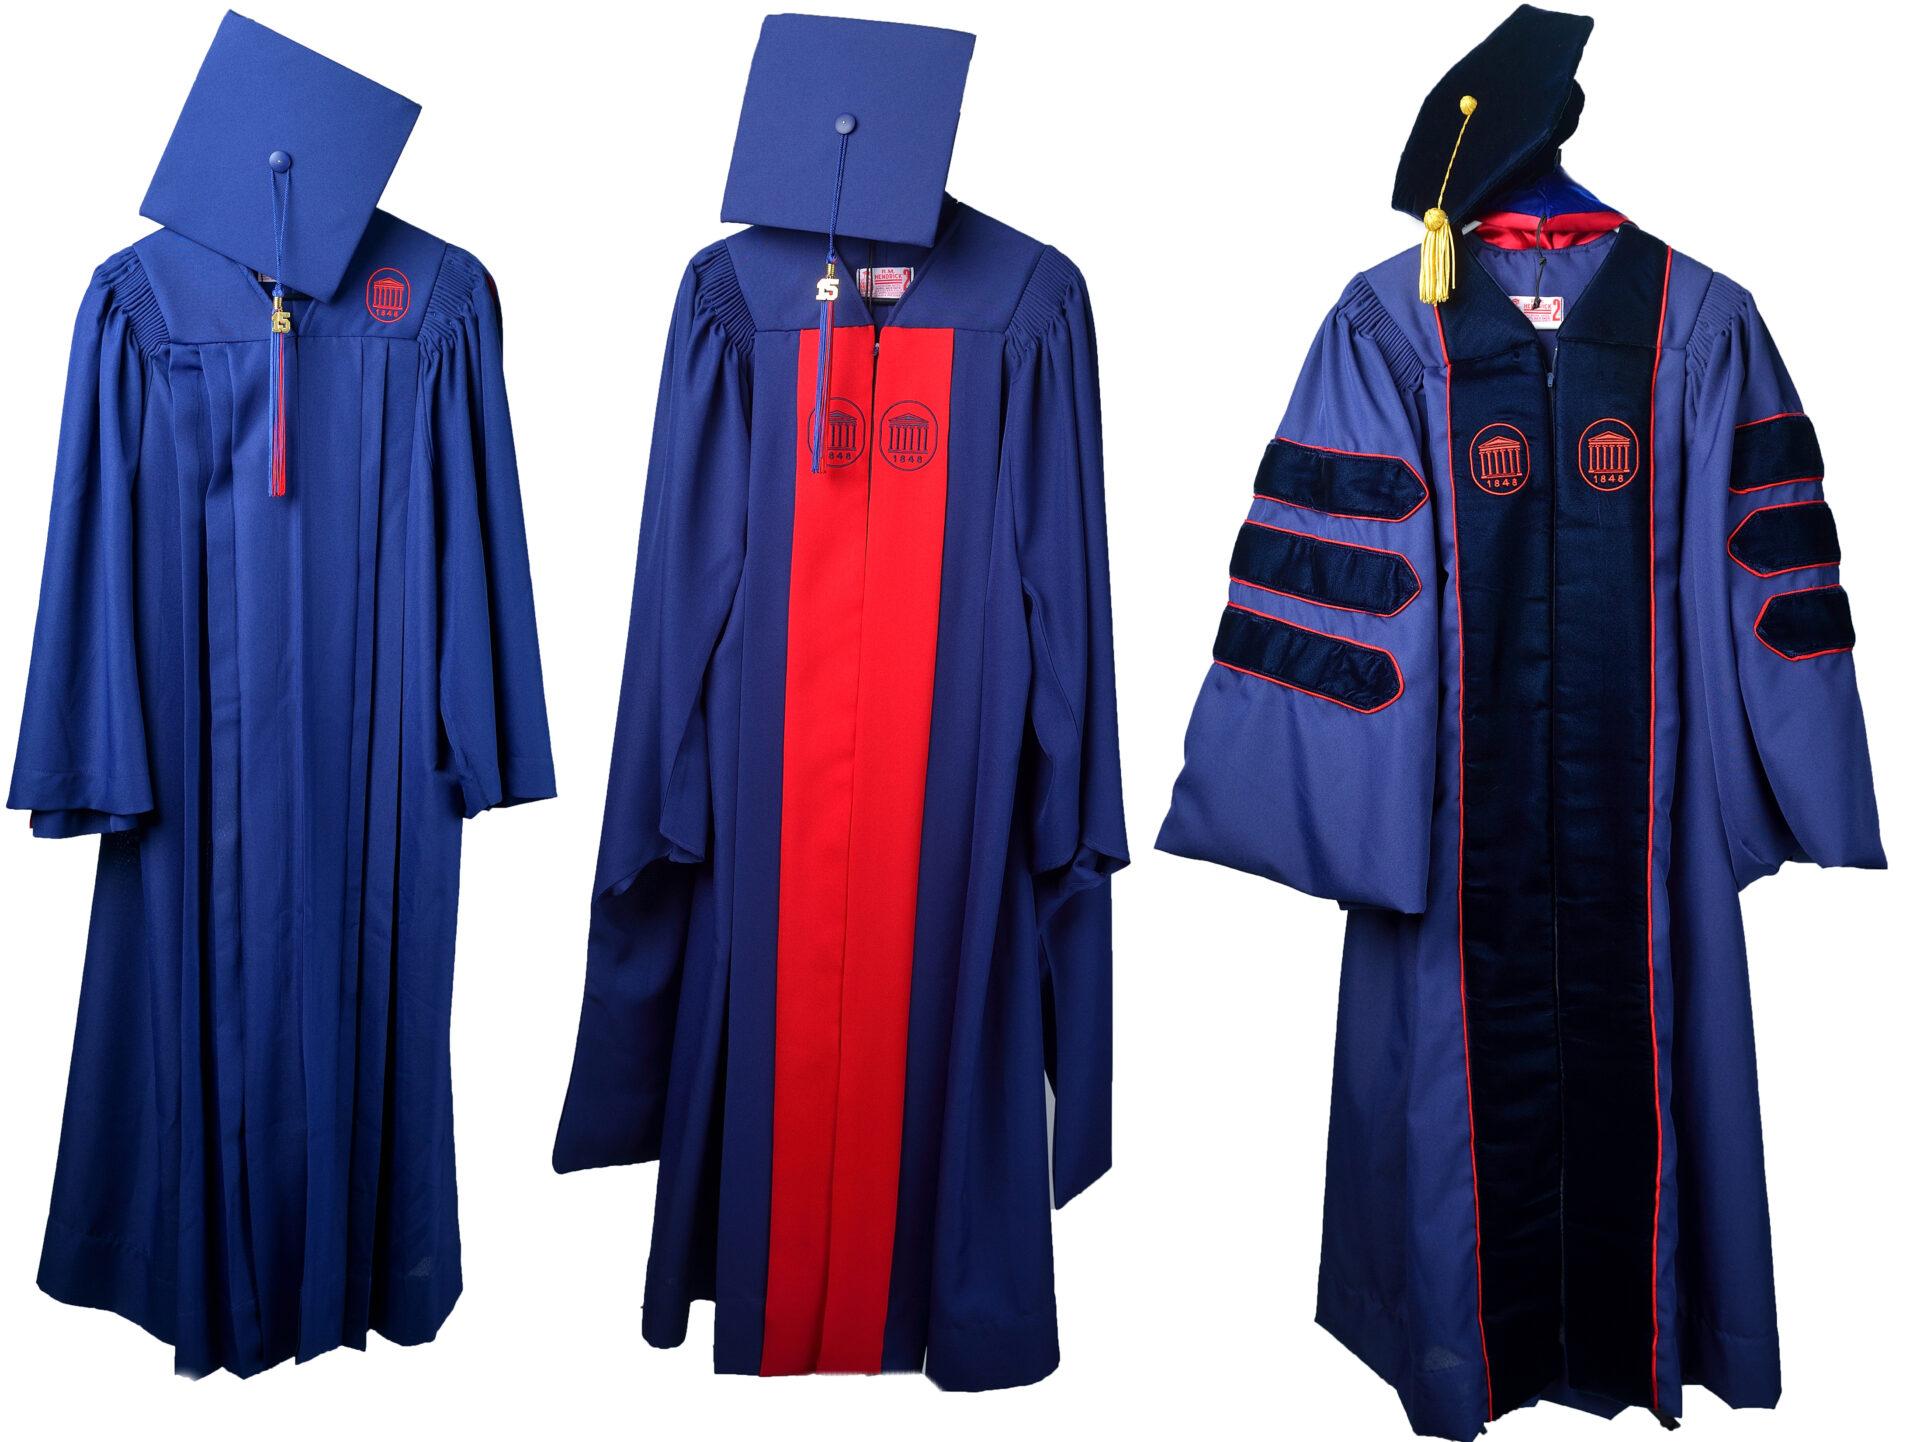 UM Announces New Graduation Regalia, Graduation Schedule ...